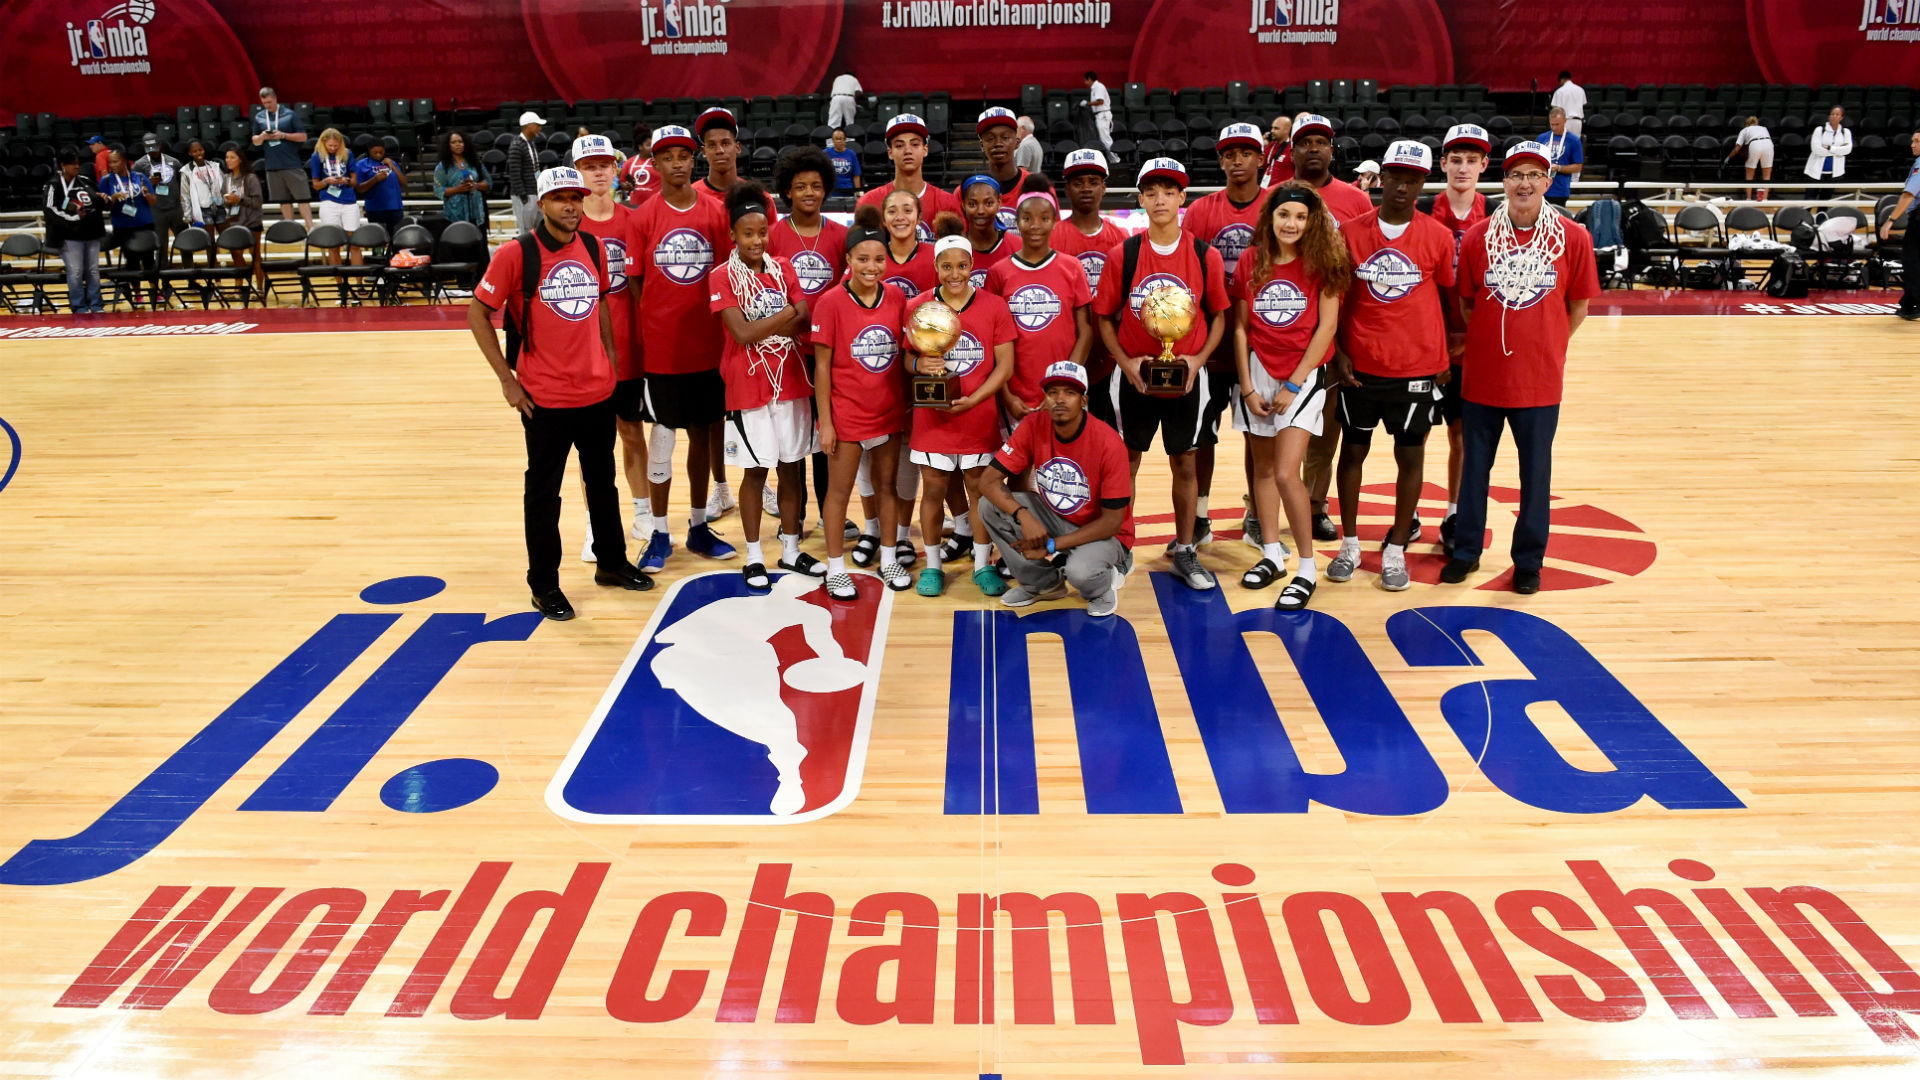 Jr. NBA Global Championship Qualifying Tournament Returns